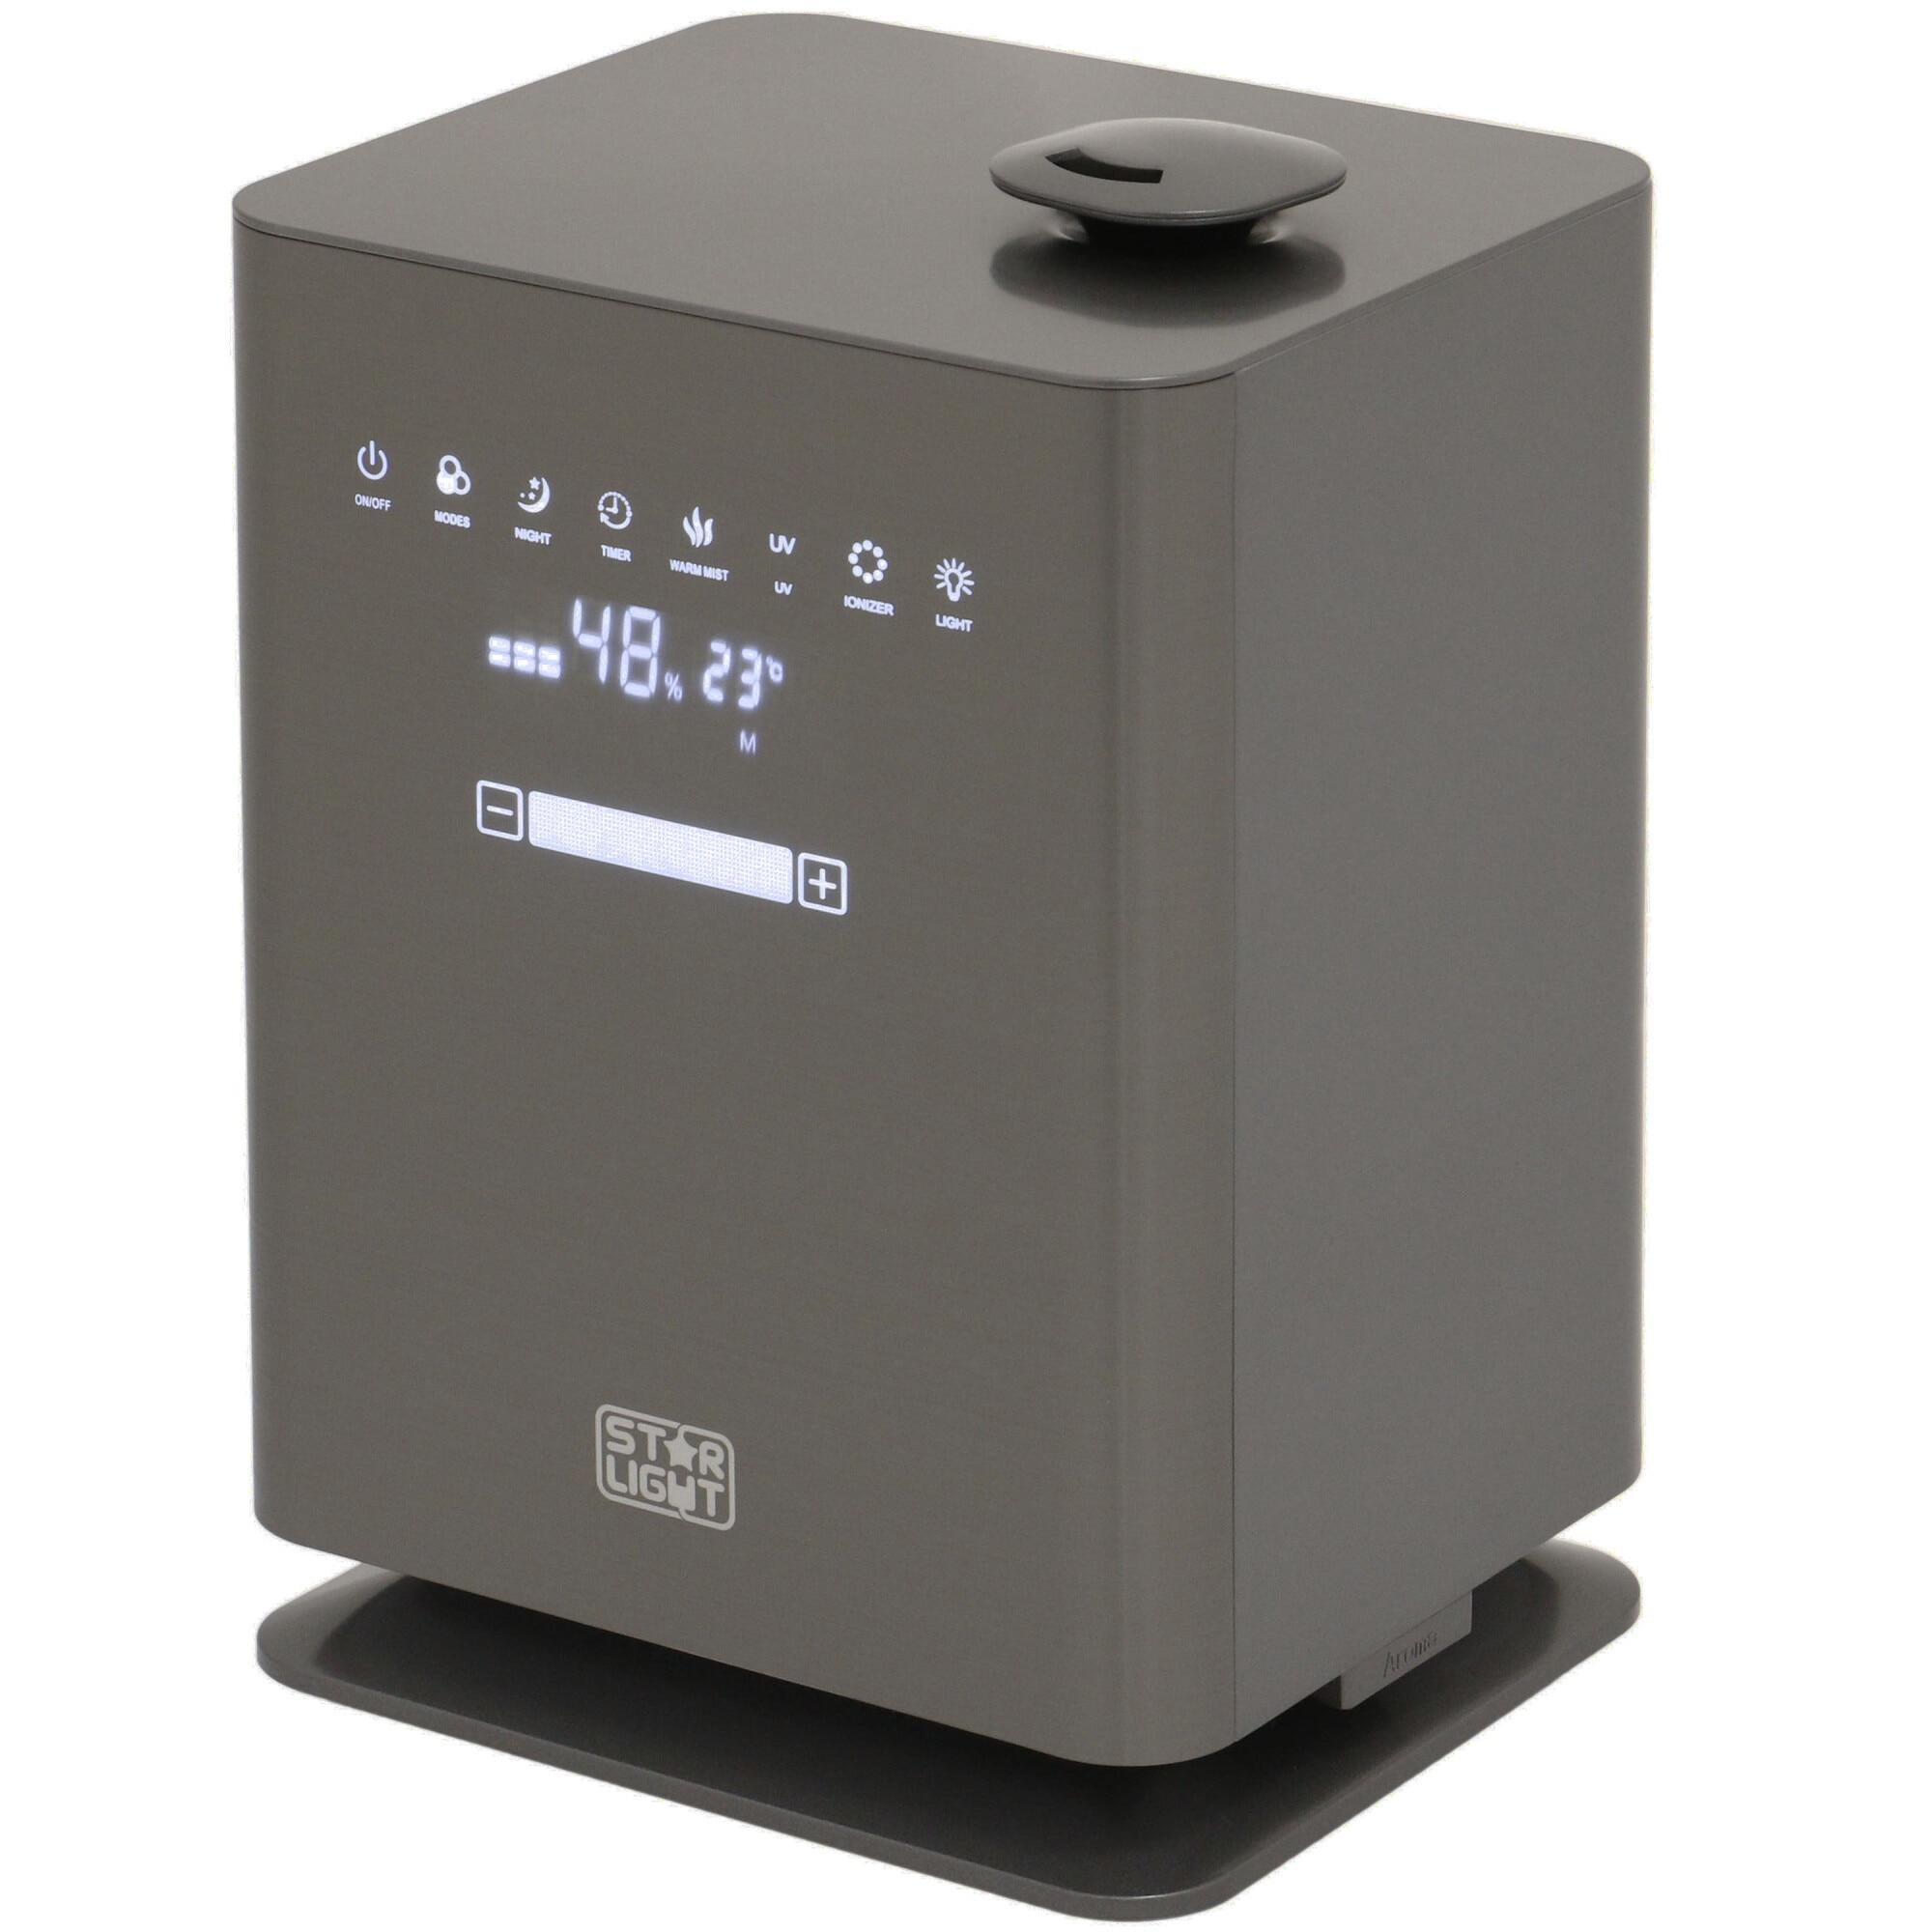 Fotografie Umidificator de aer Star-Light UHS-4511UG, rezervor 4.5L, Display LED, Functie Plasma, Lampa UV, Abur cald/rece, Control touch, Timer, Telecomanda, Gri